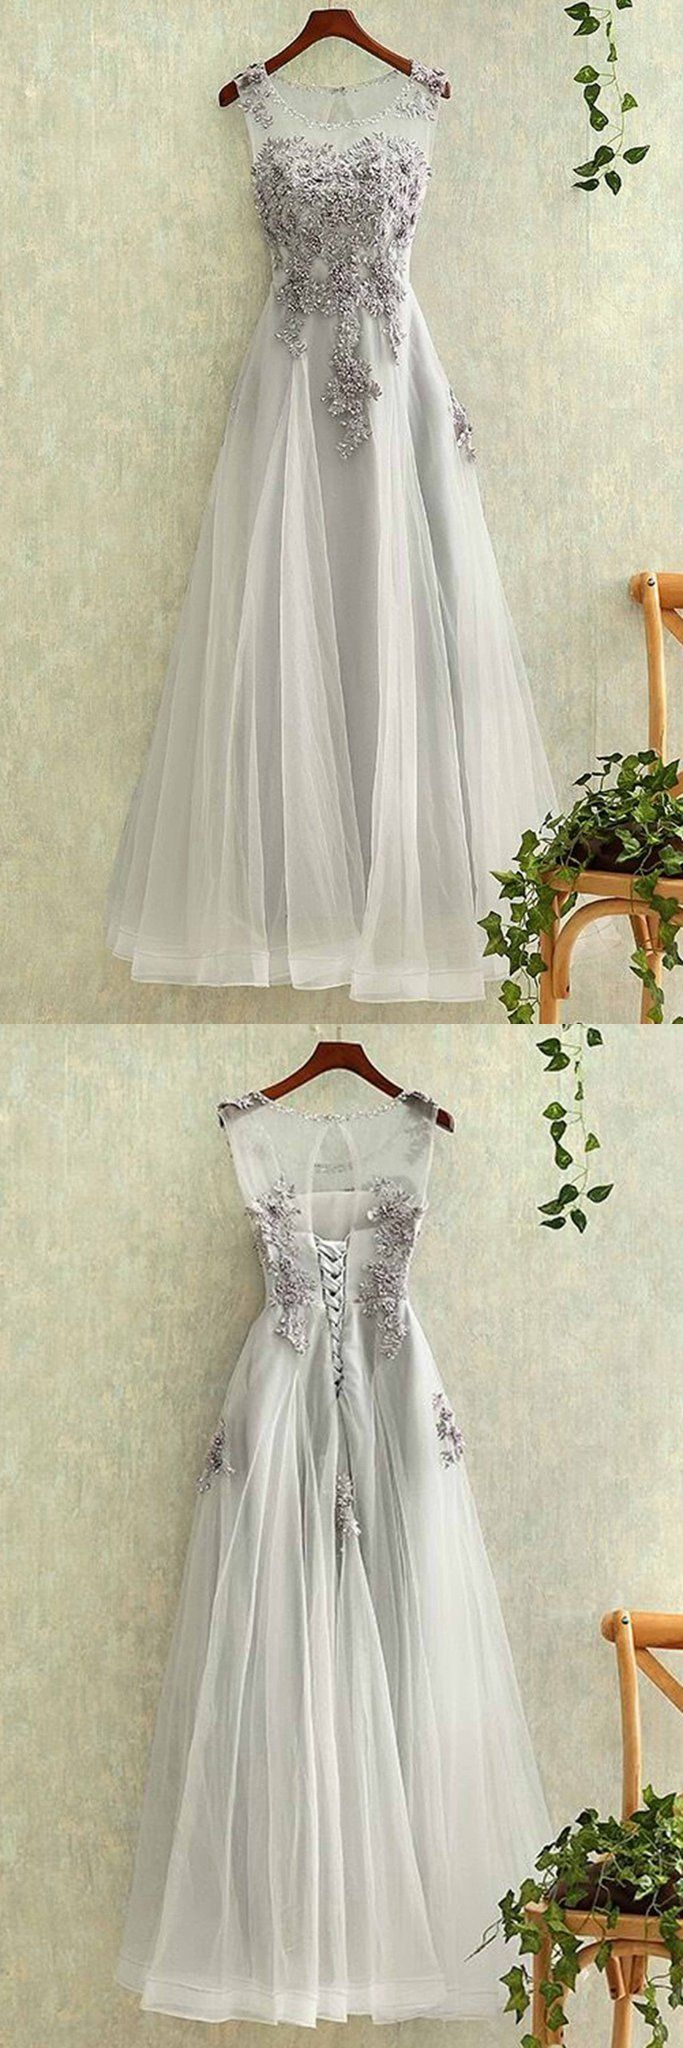 best dresses images on pinterest long prom dresses party